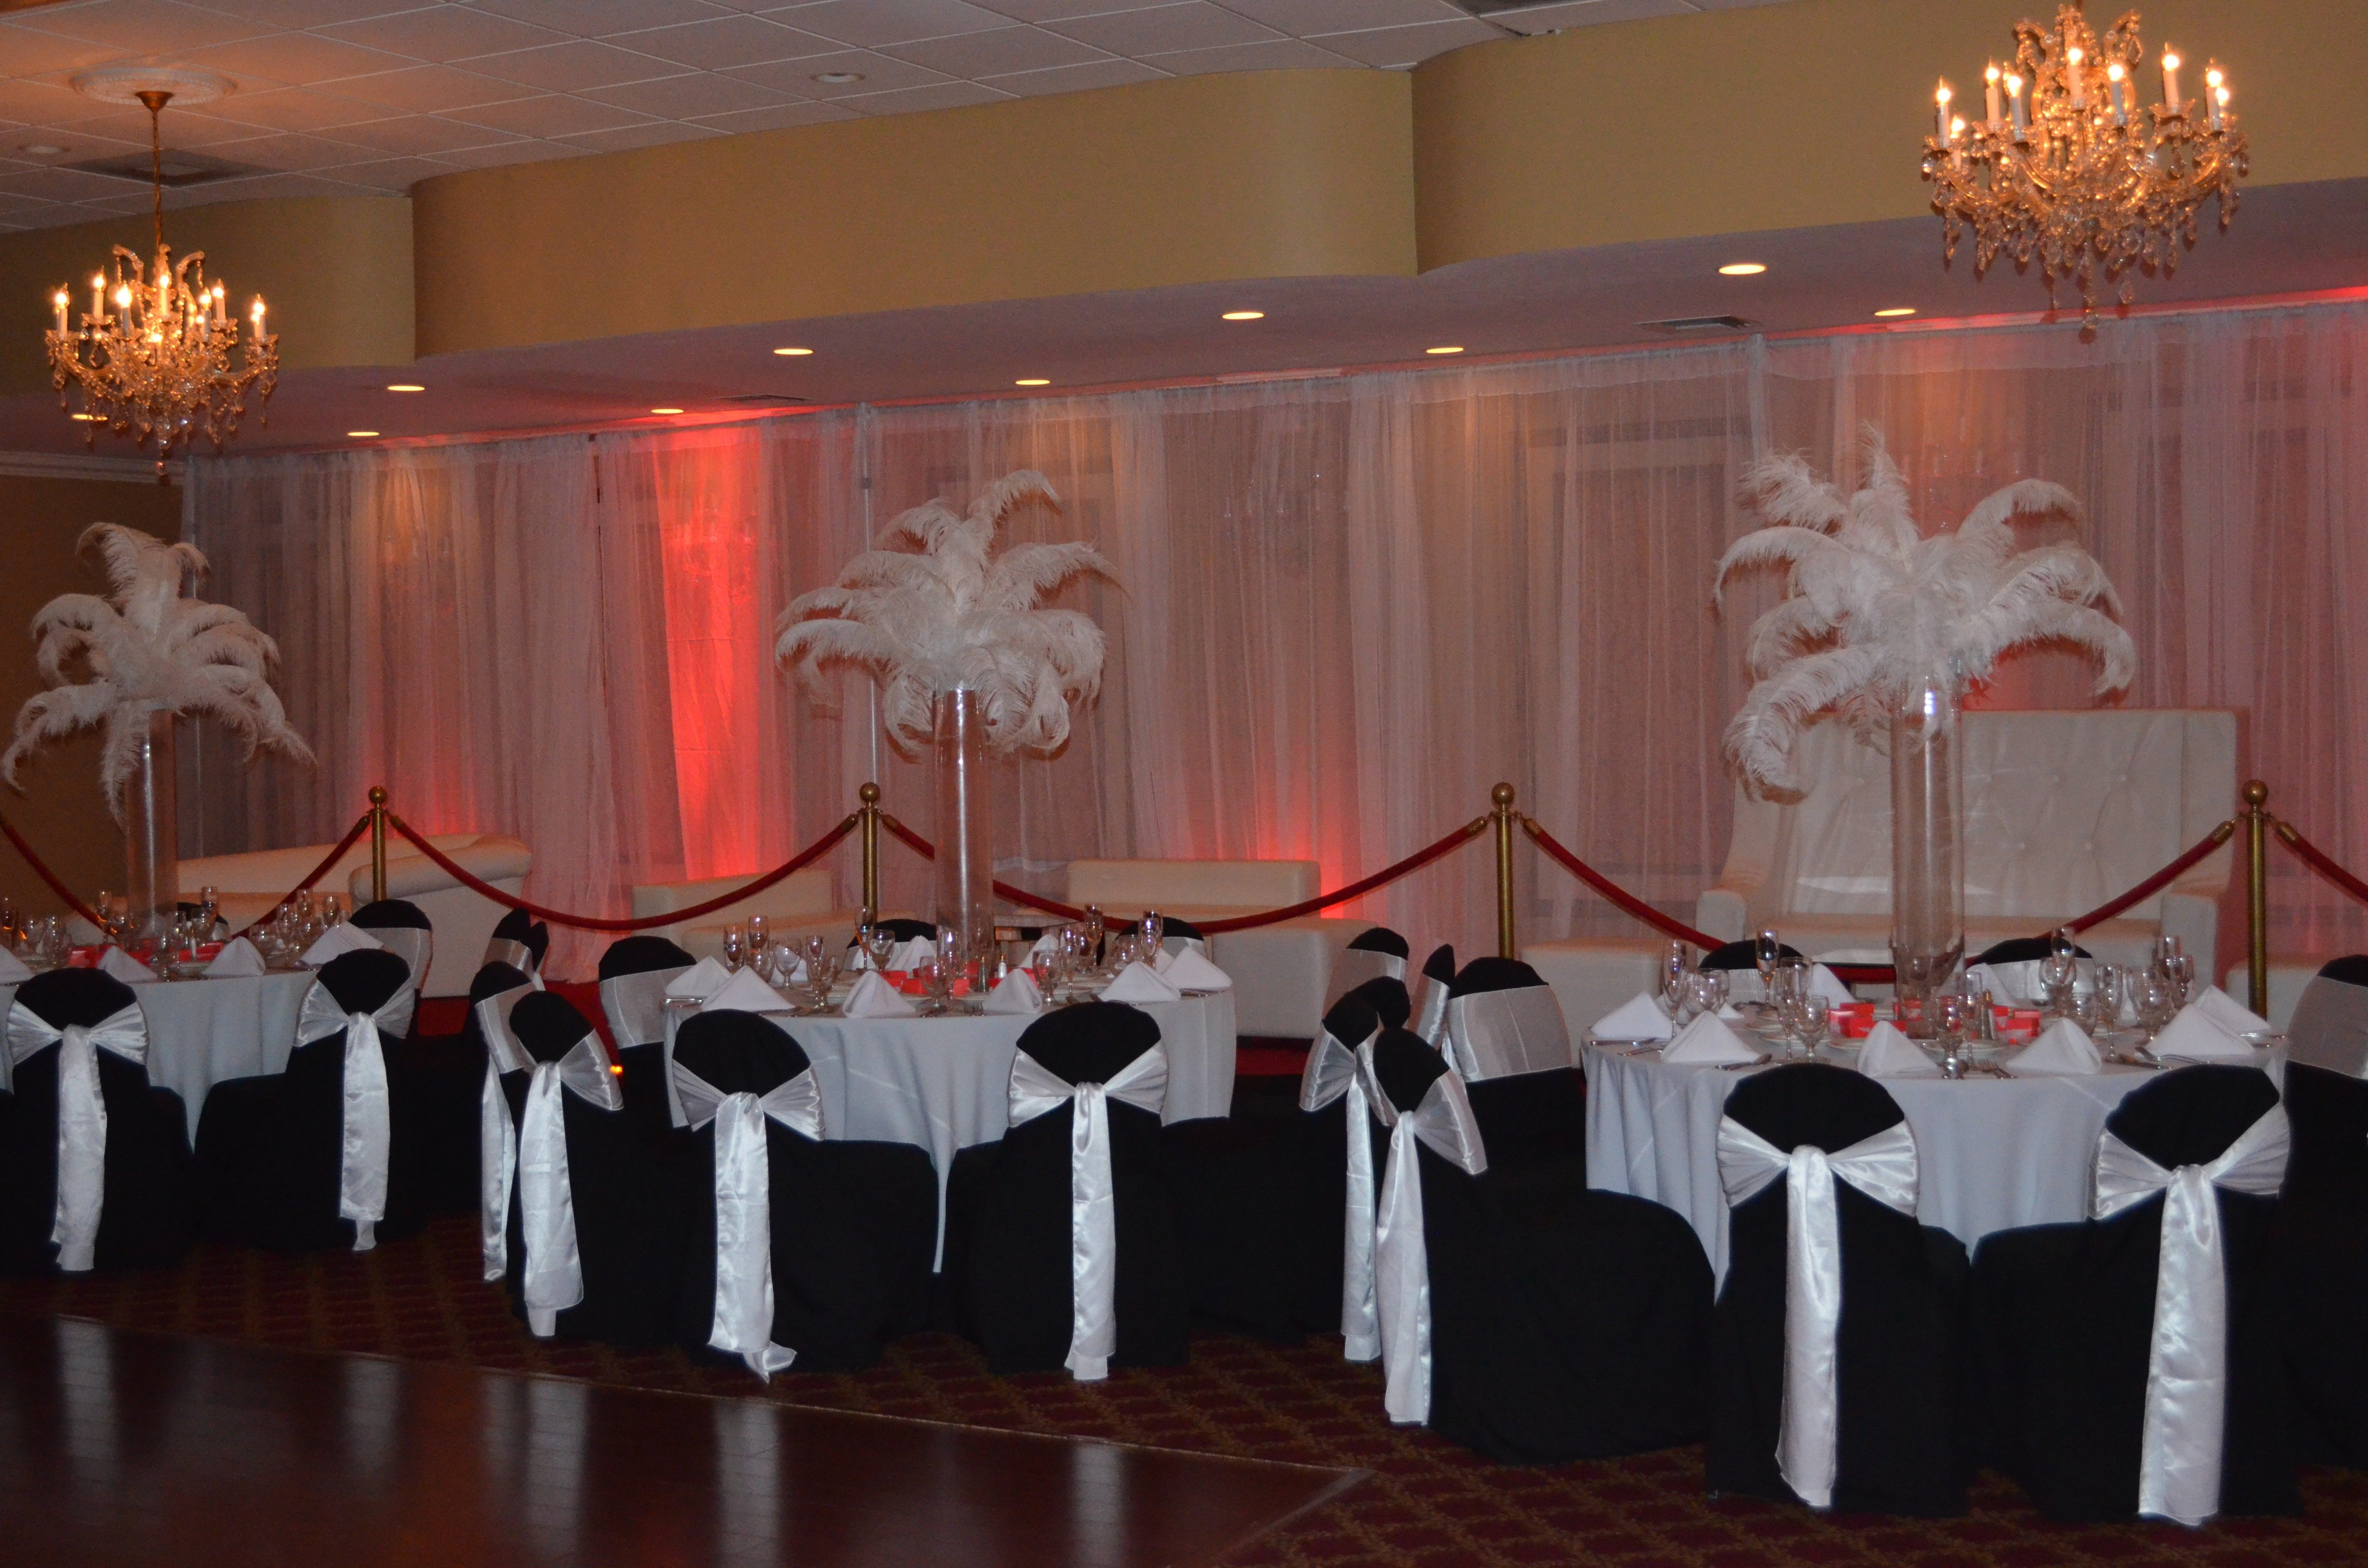 10 Unique Ideas For 15Th Birthday Party wedding venues miami laurette 15th birthday party 2020